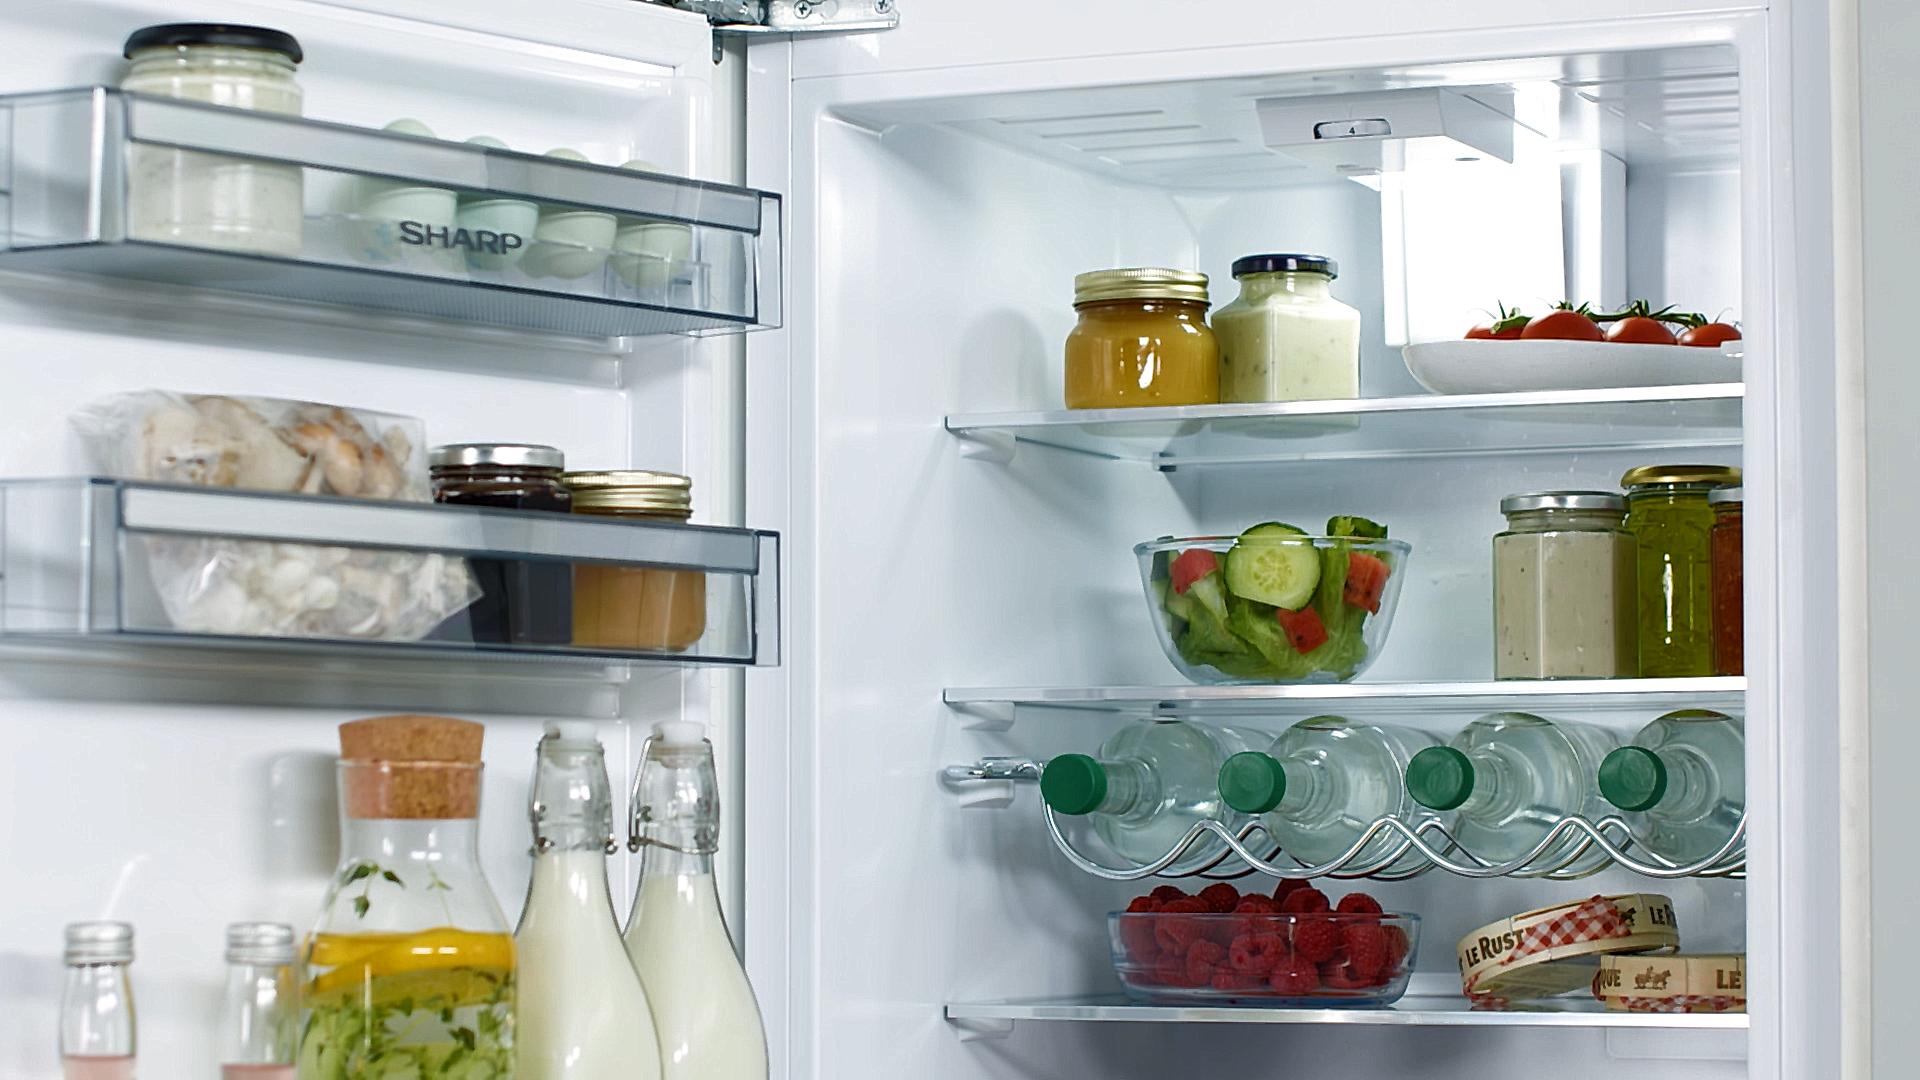 Tii cura de slabire? Iata 5 alimente pe care sa le ai TOT TIMPUL in frigider - papaieftin.ro